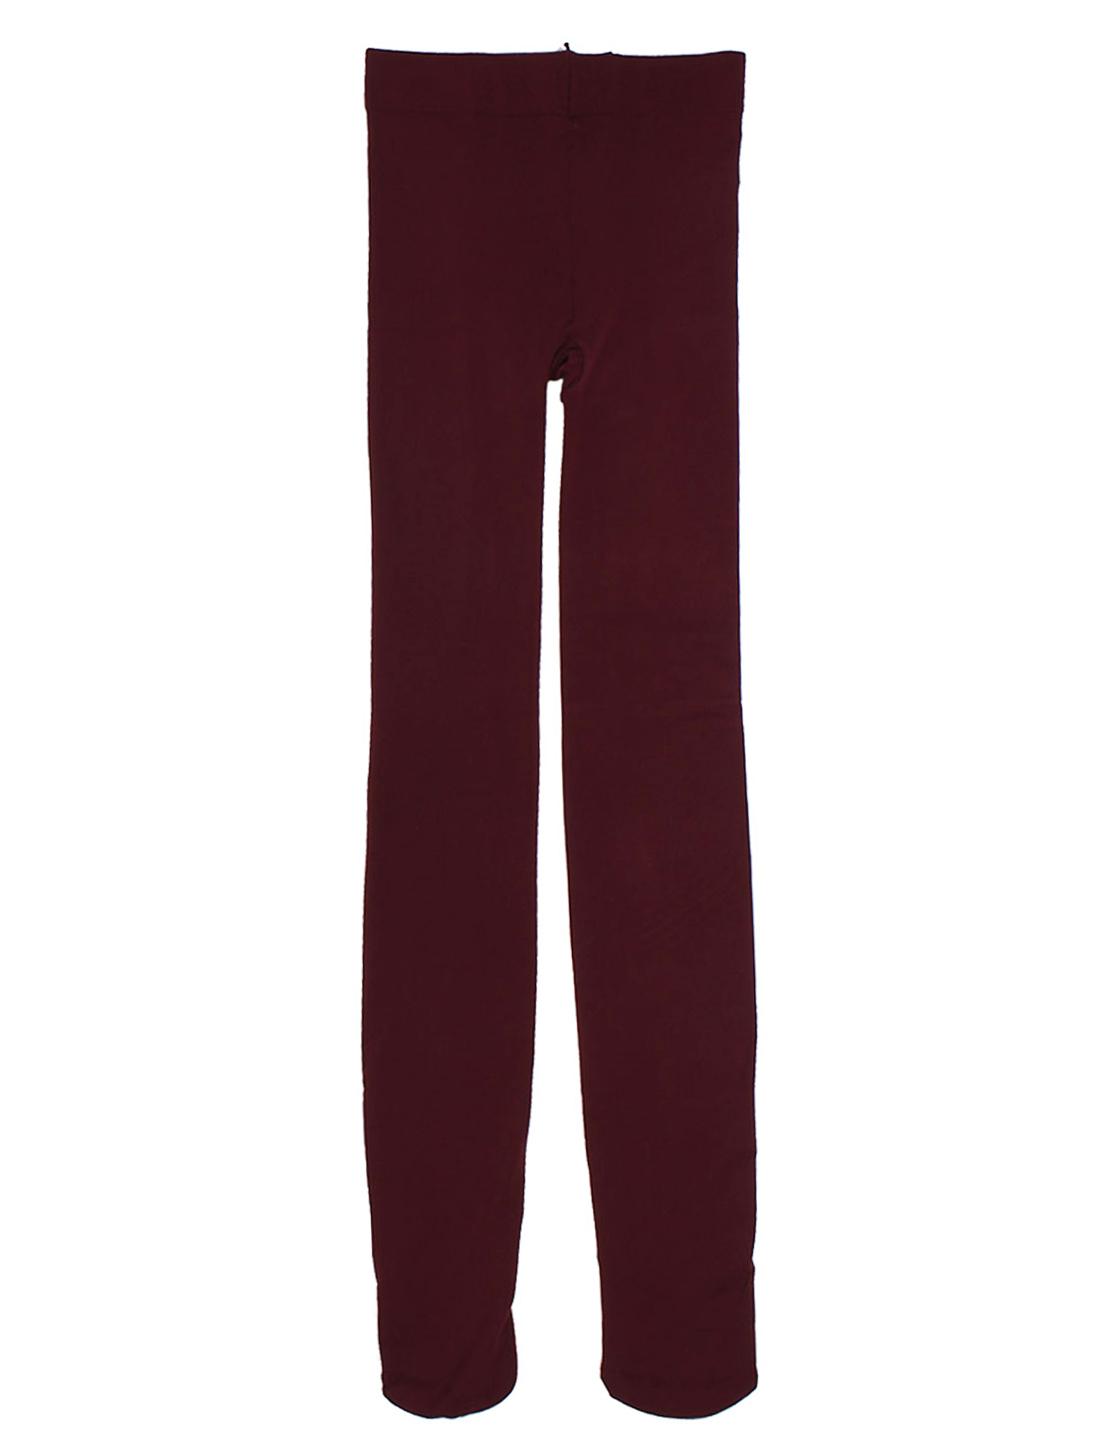 Women Elastic Waist Footed Skinny Tights Thicken Leggings Pantyhose Burgundy